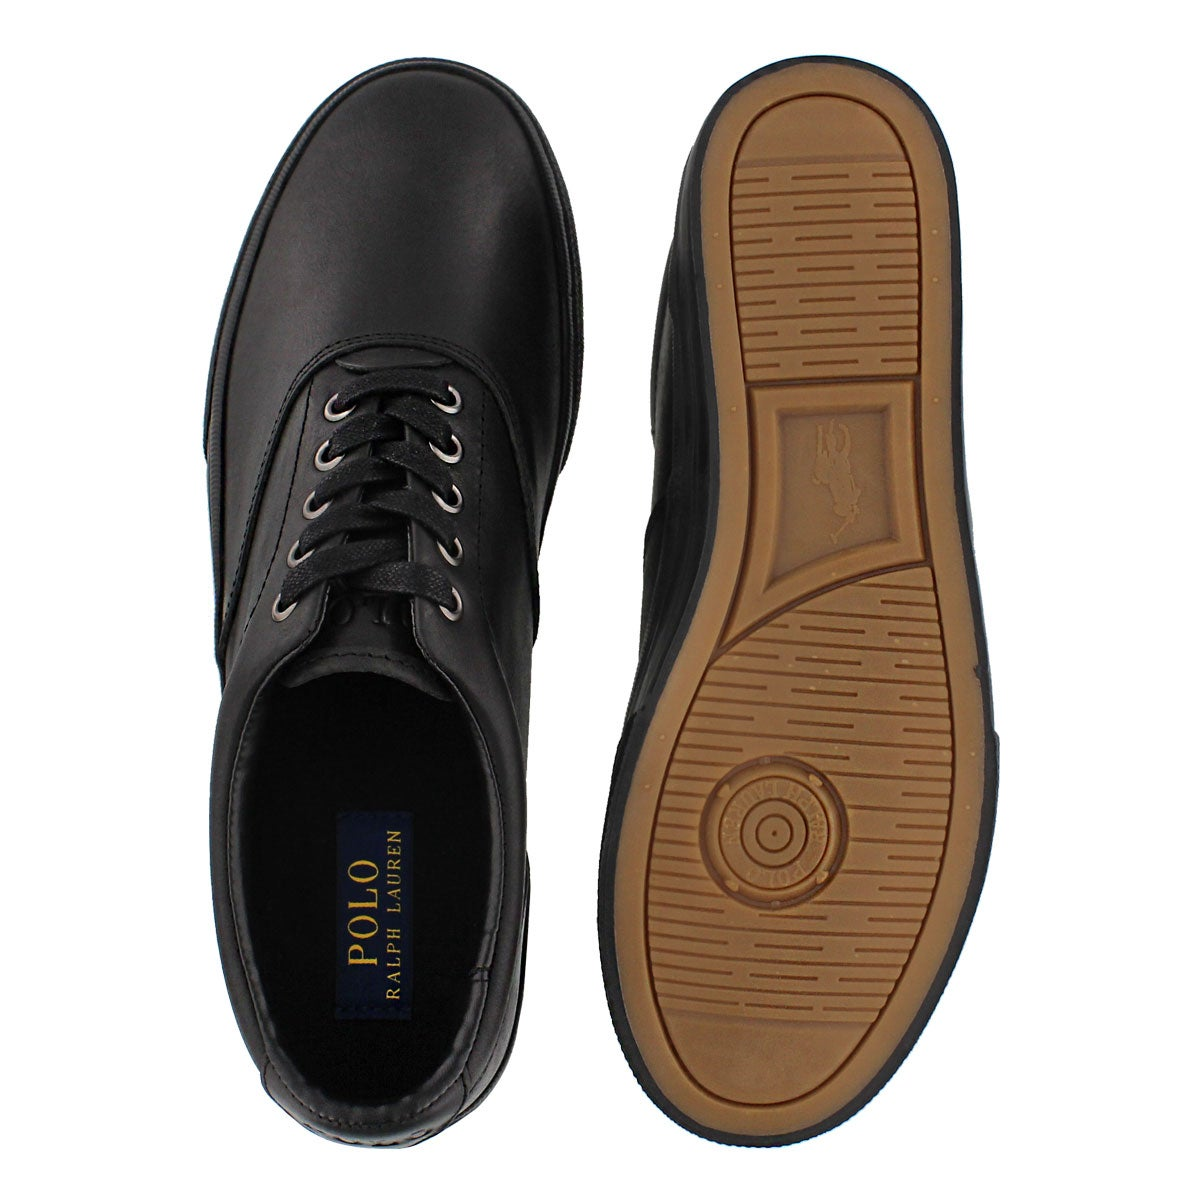 Mns Vaughn blk/blk lace up sneaker